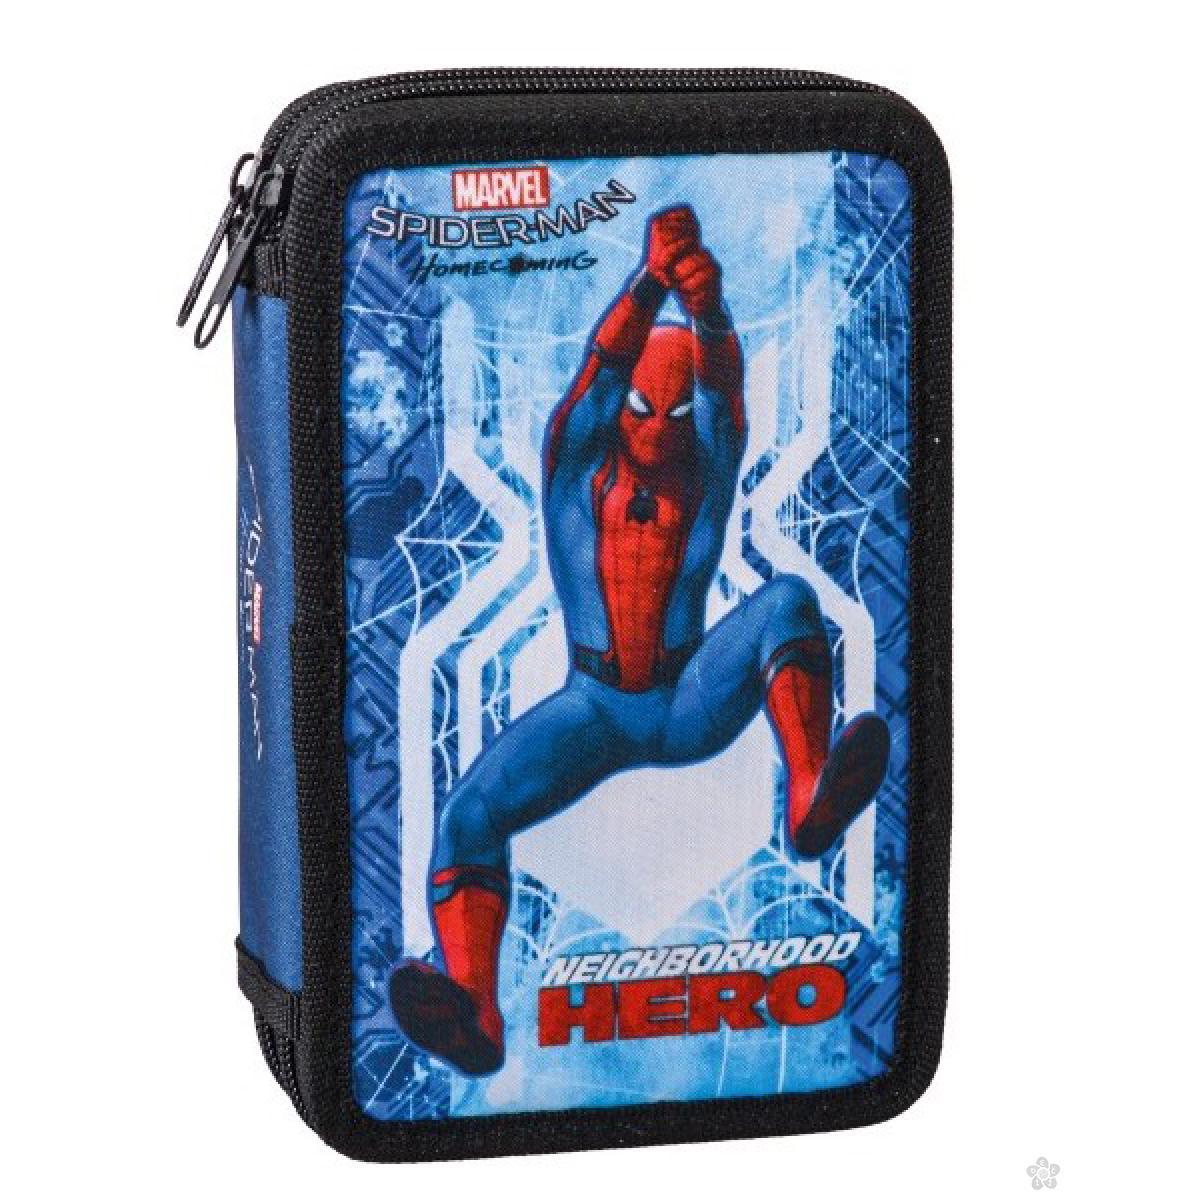 Pernica puna 2 zipa, Double Decker Spiderman 316442